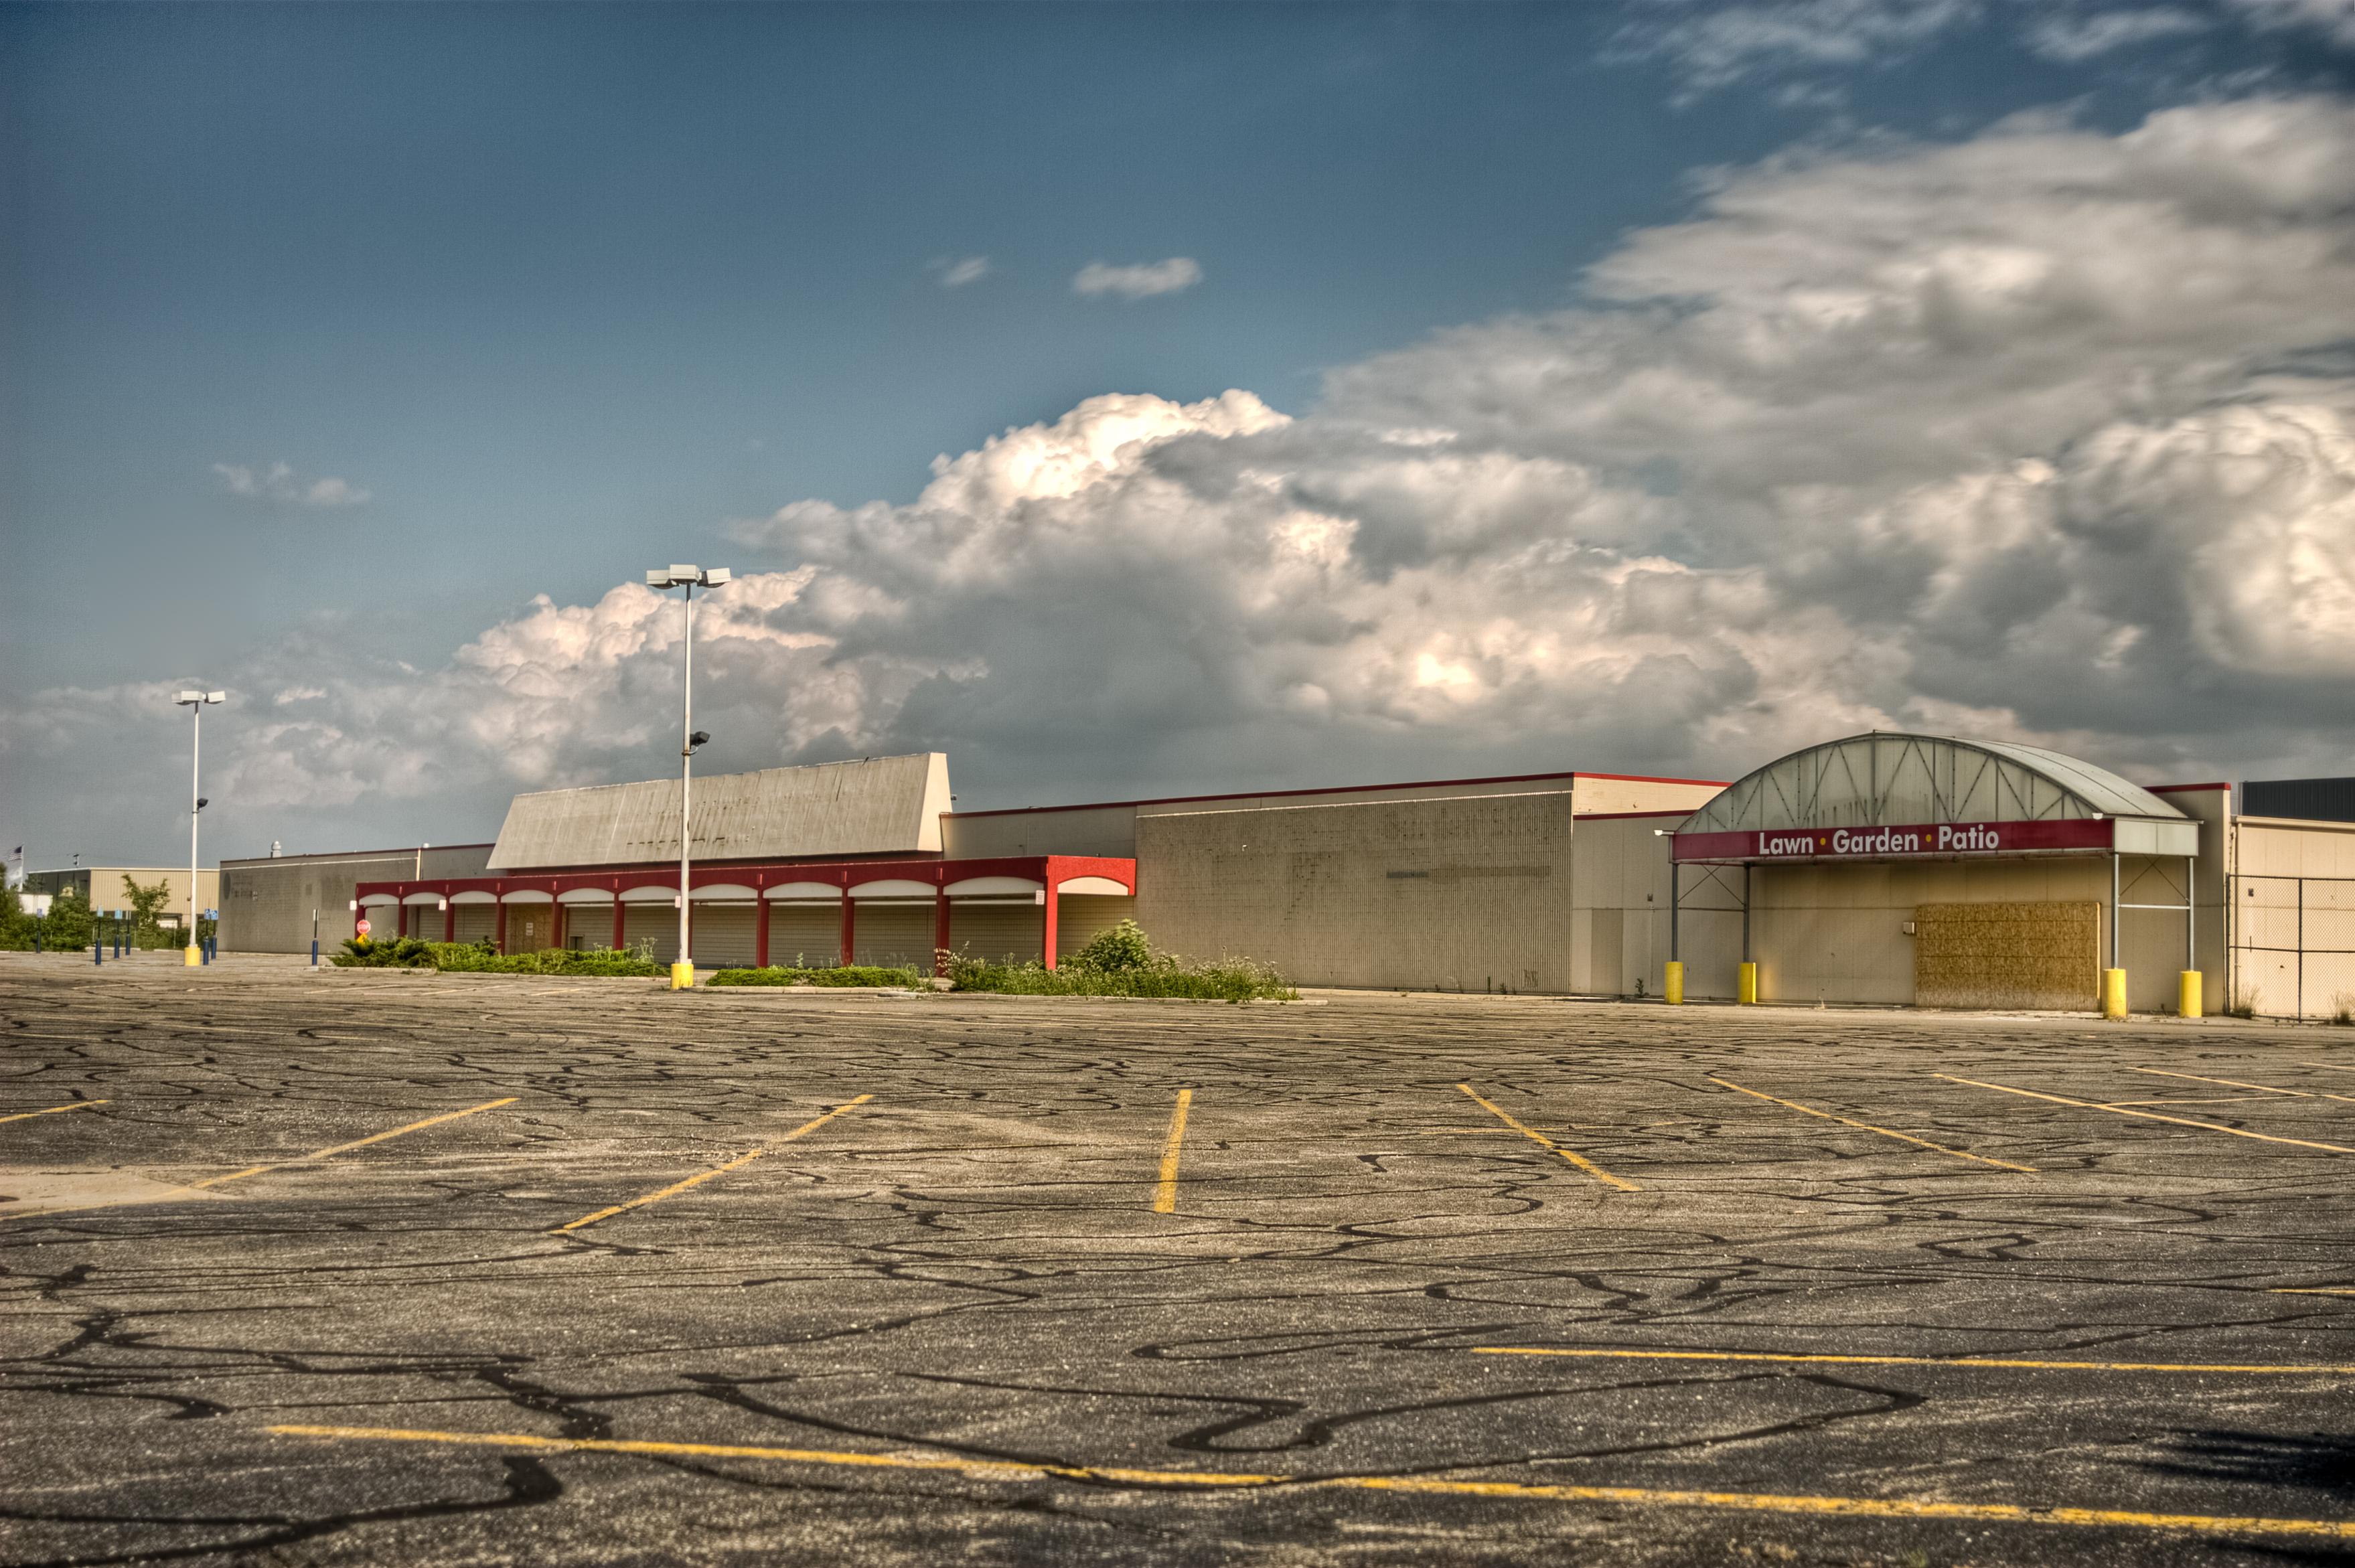 An abandoned shopping center, as seen from across a crumbling parking lot.